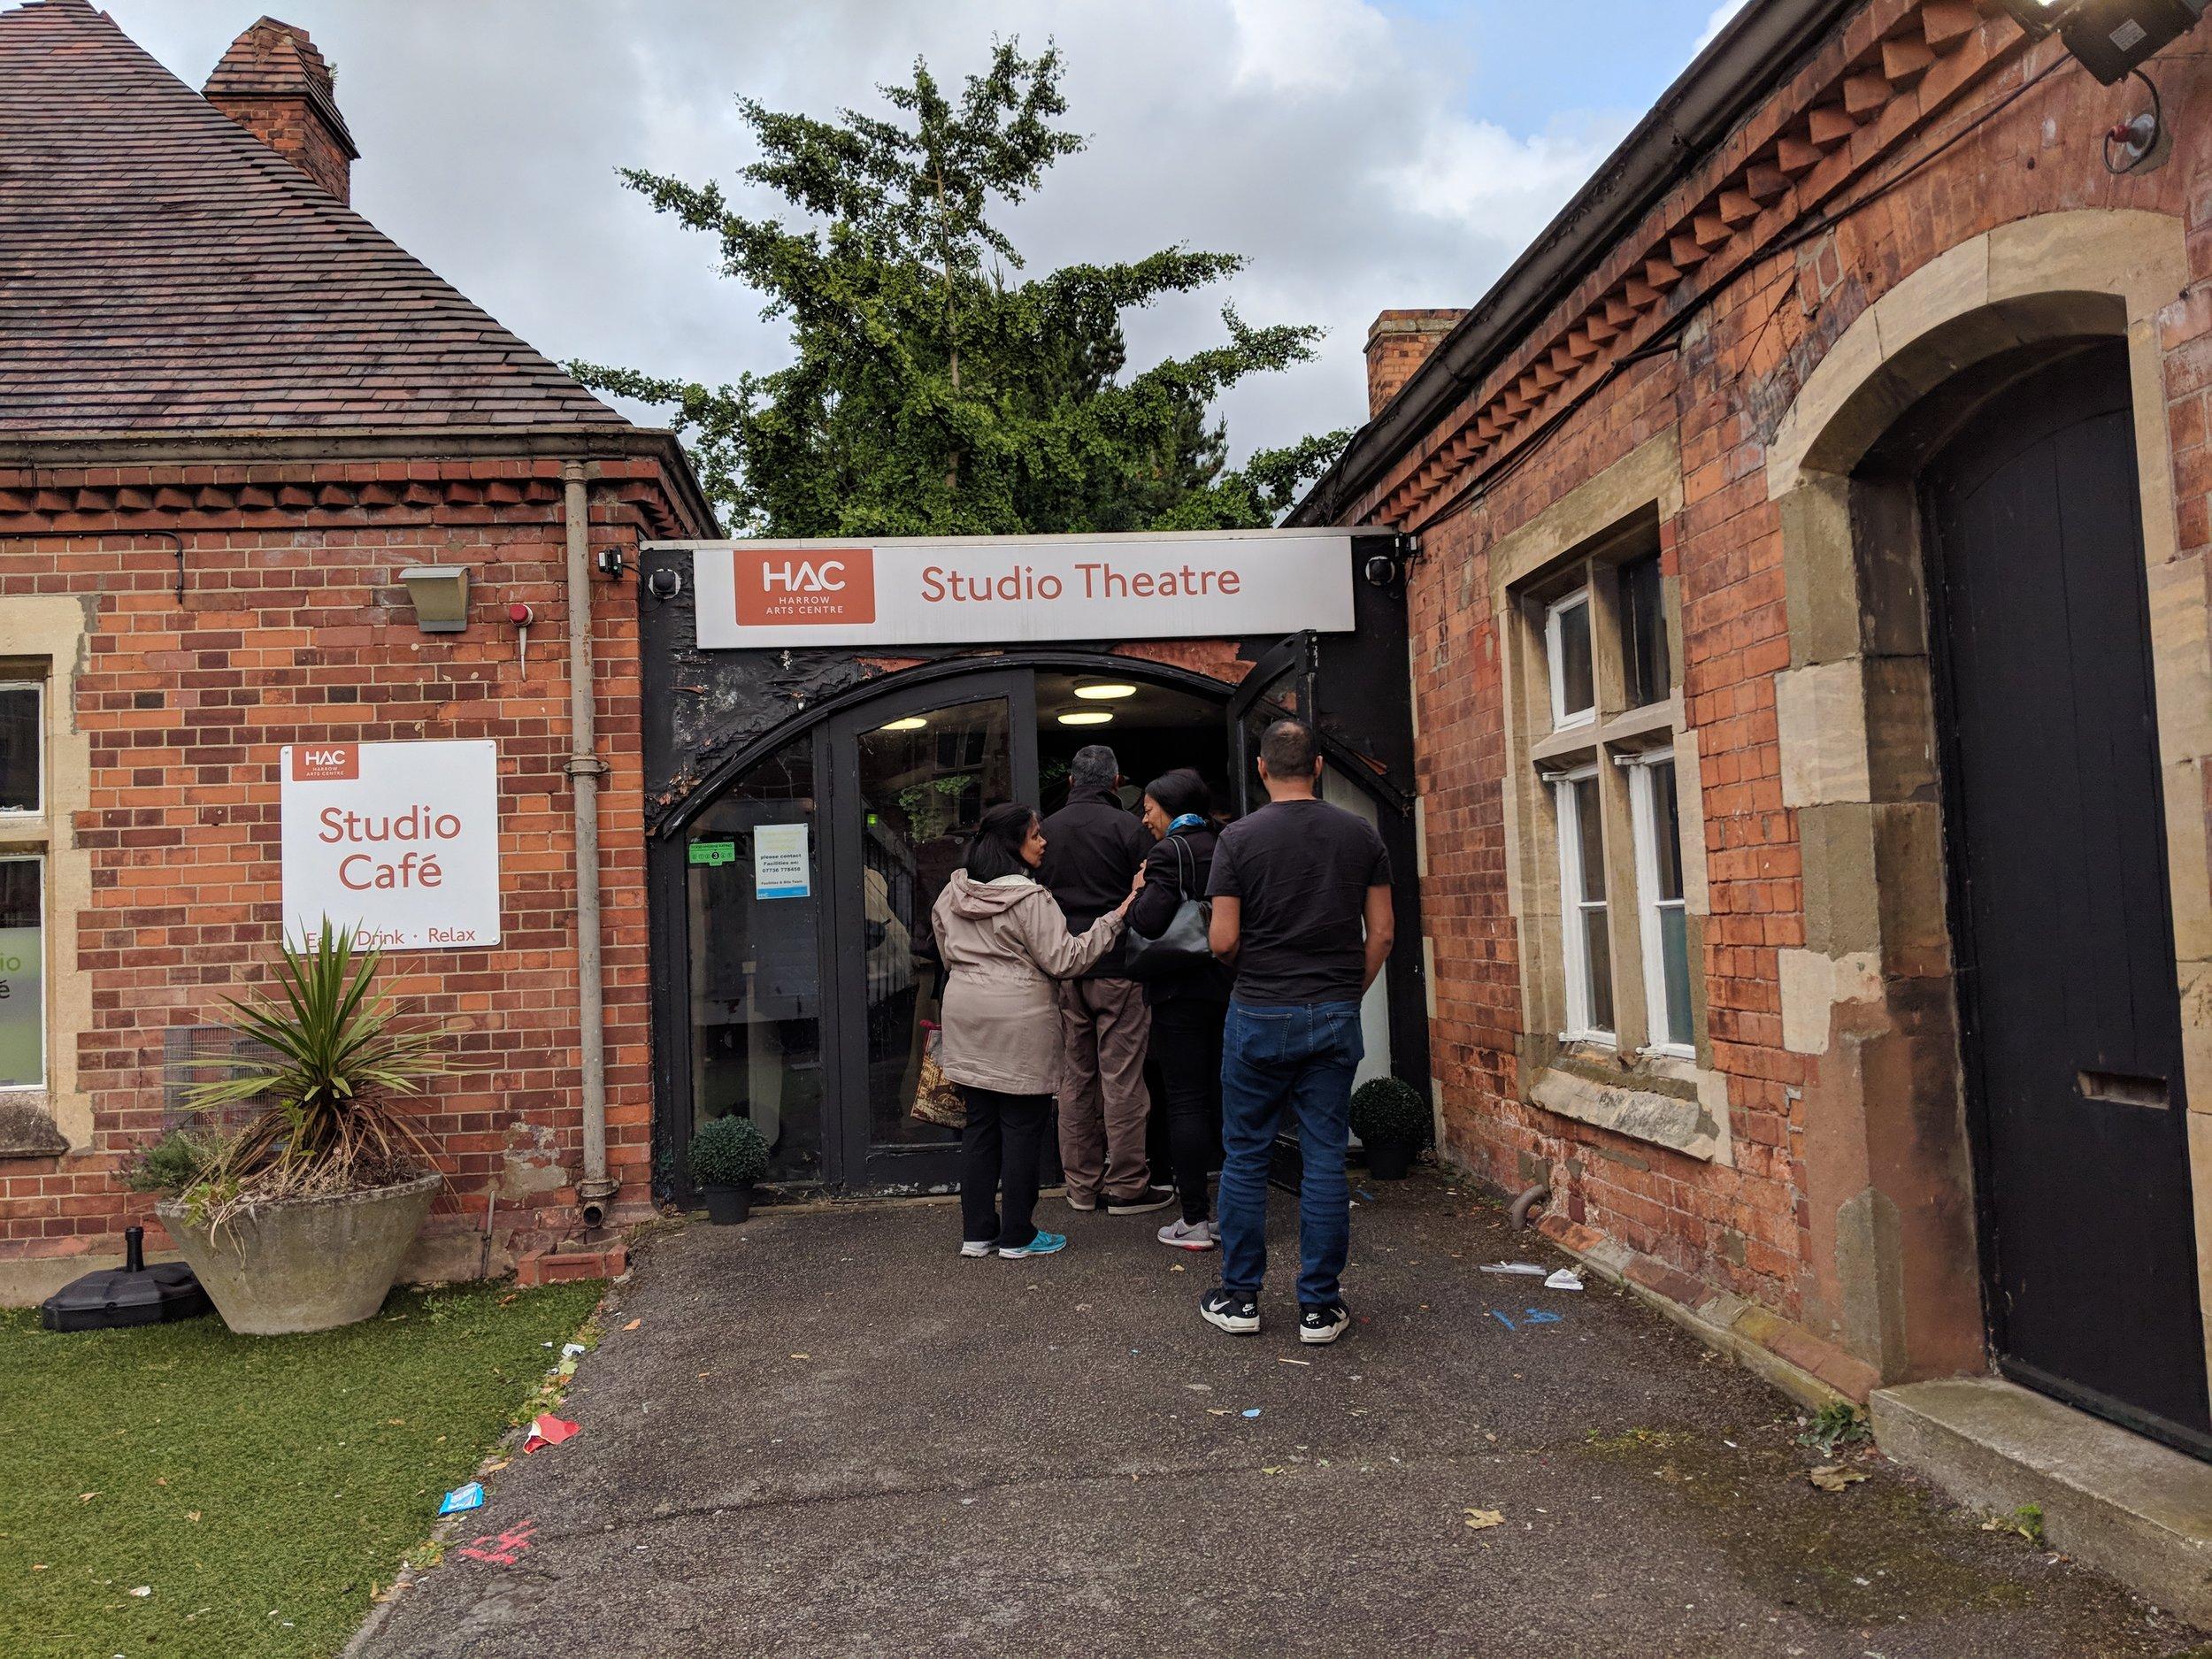 Harrow Arts Centre(Studio Theatre) - visited 15/06/2019